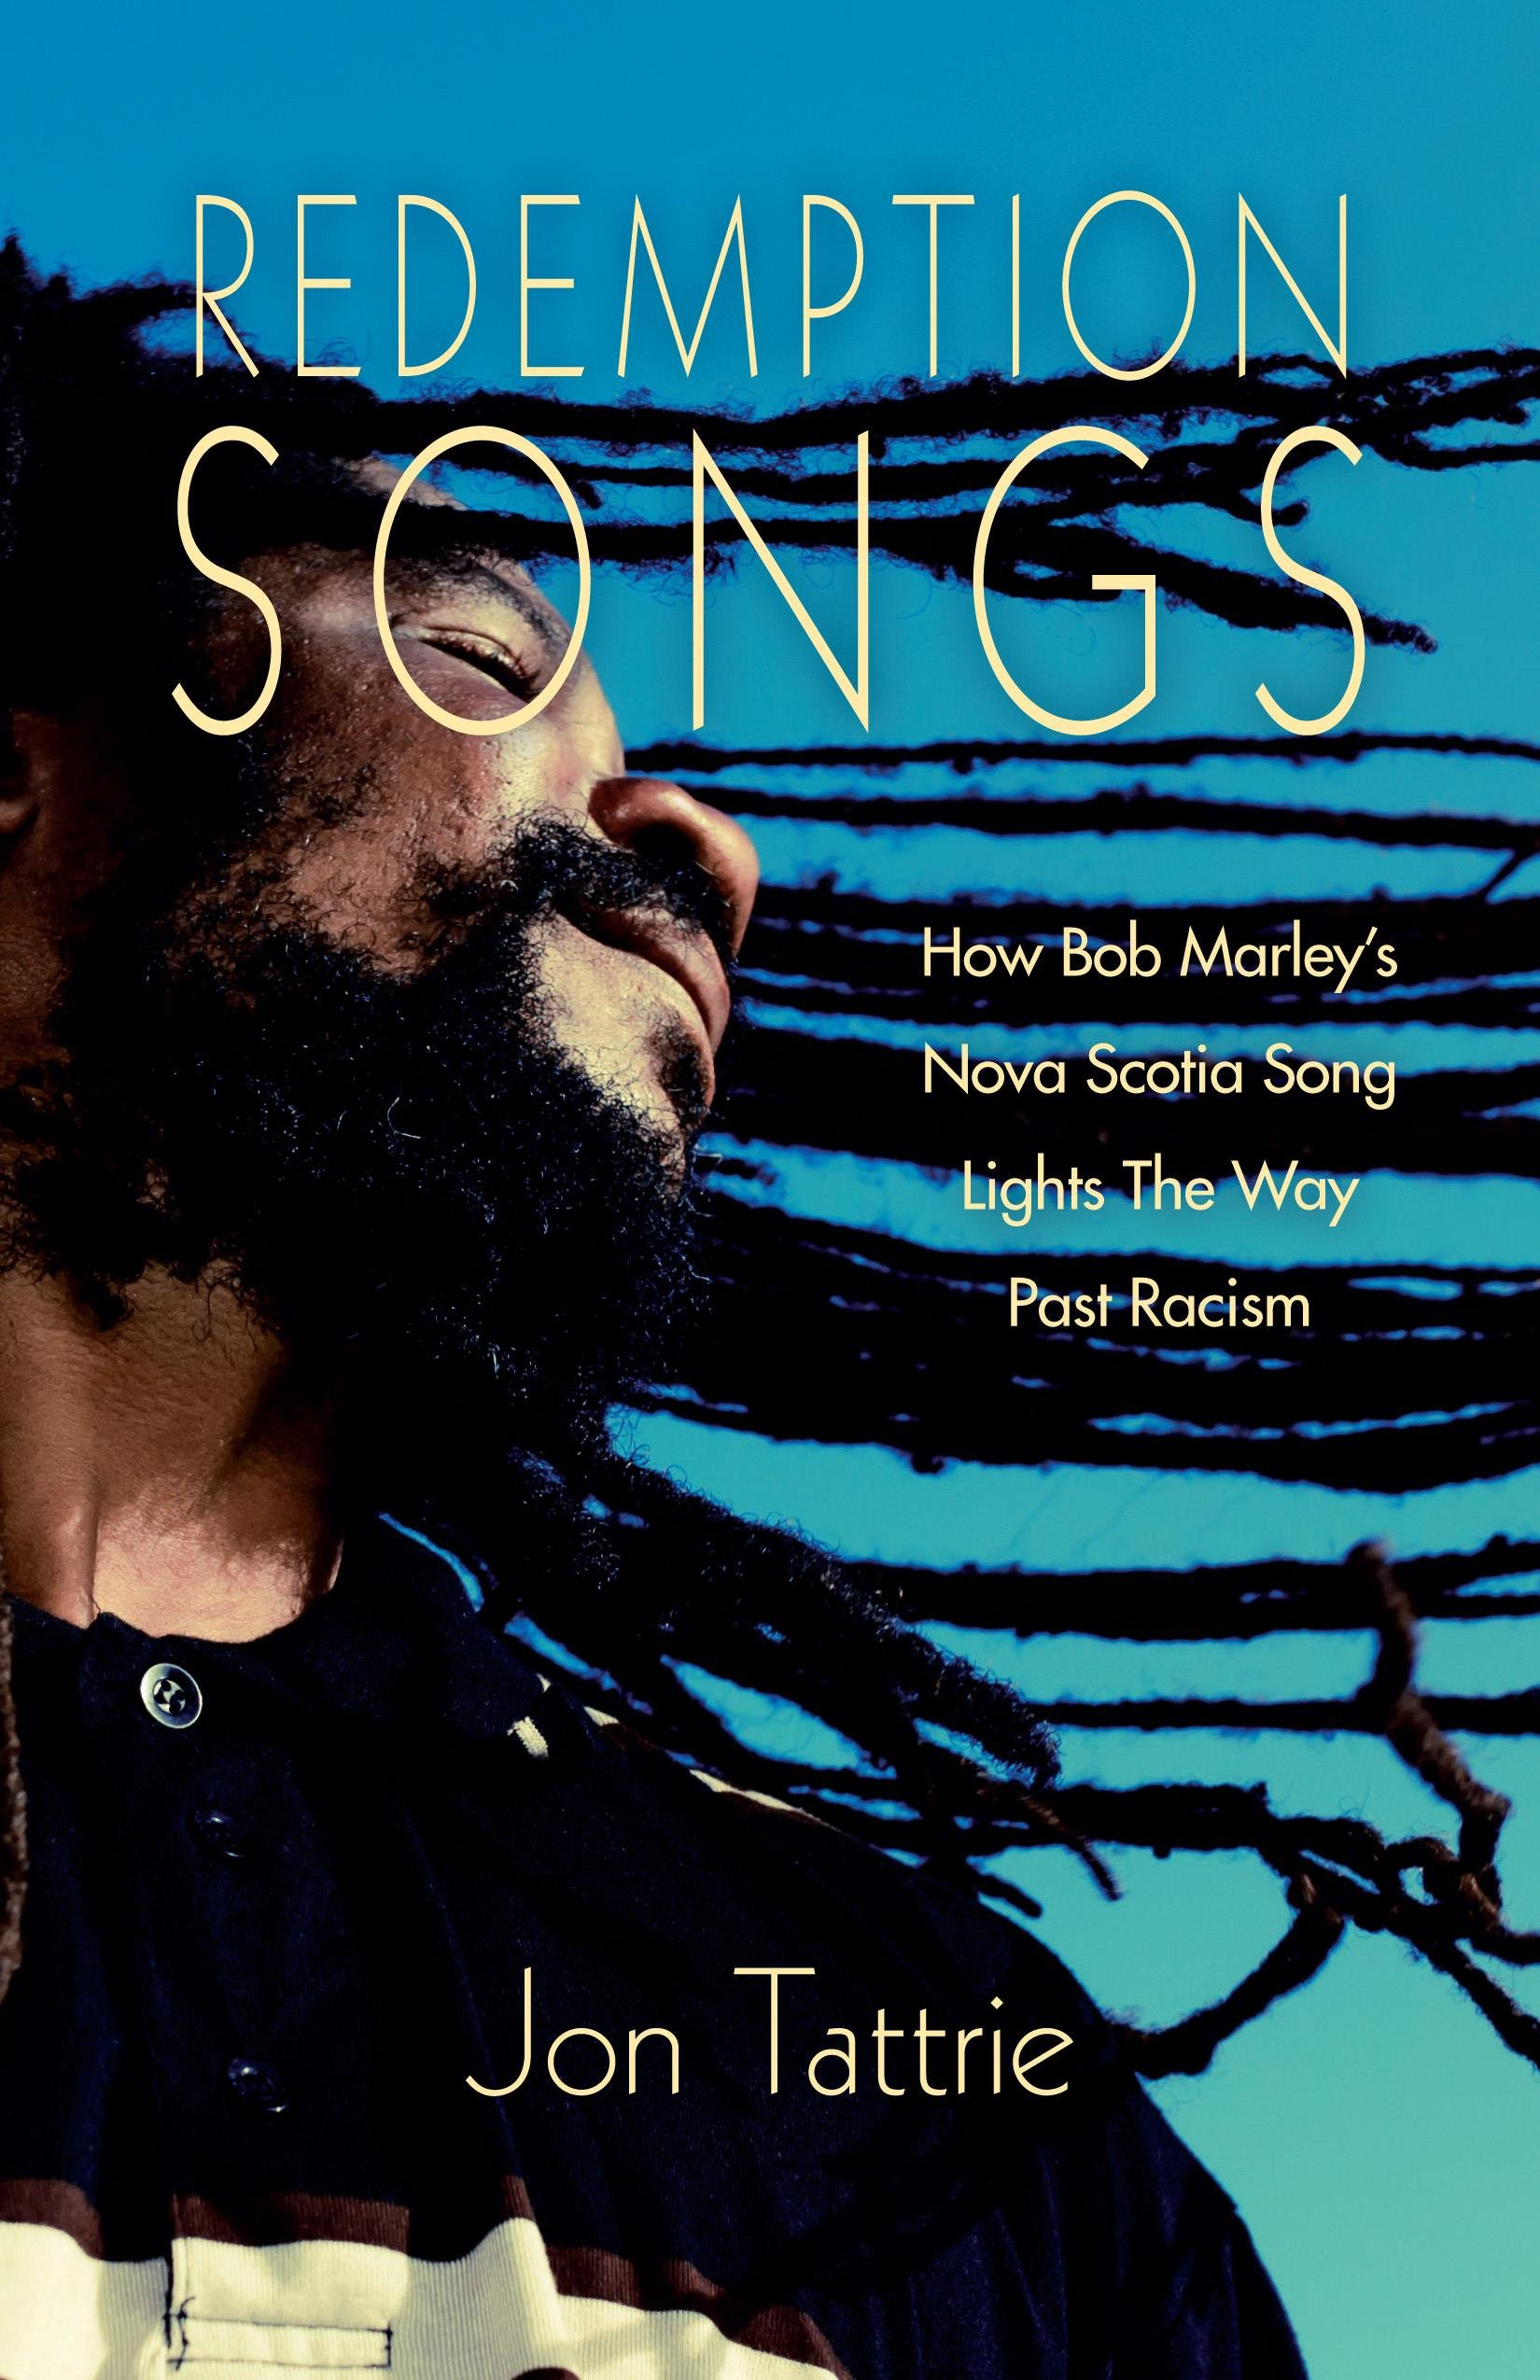 Redemption songs how bob marleys nova scotia song lights the way redemption songs how bob marleys nova scotia song lights the way past racism jon tattrie 9781897426876 books amazon aiddatafo Gallery